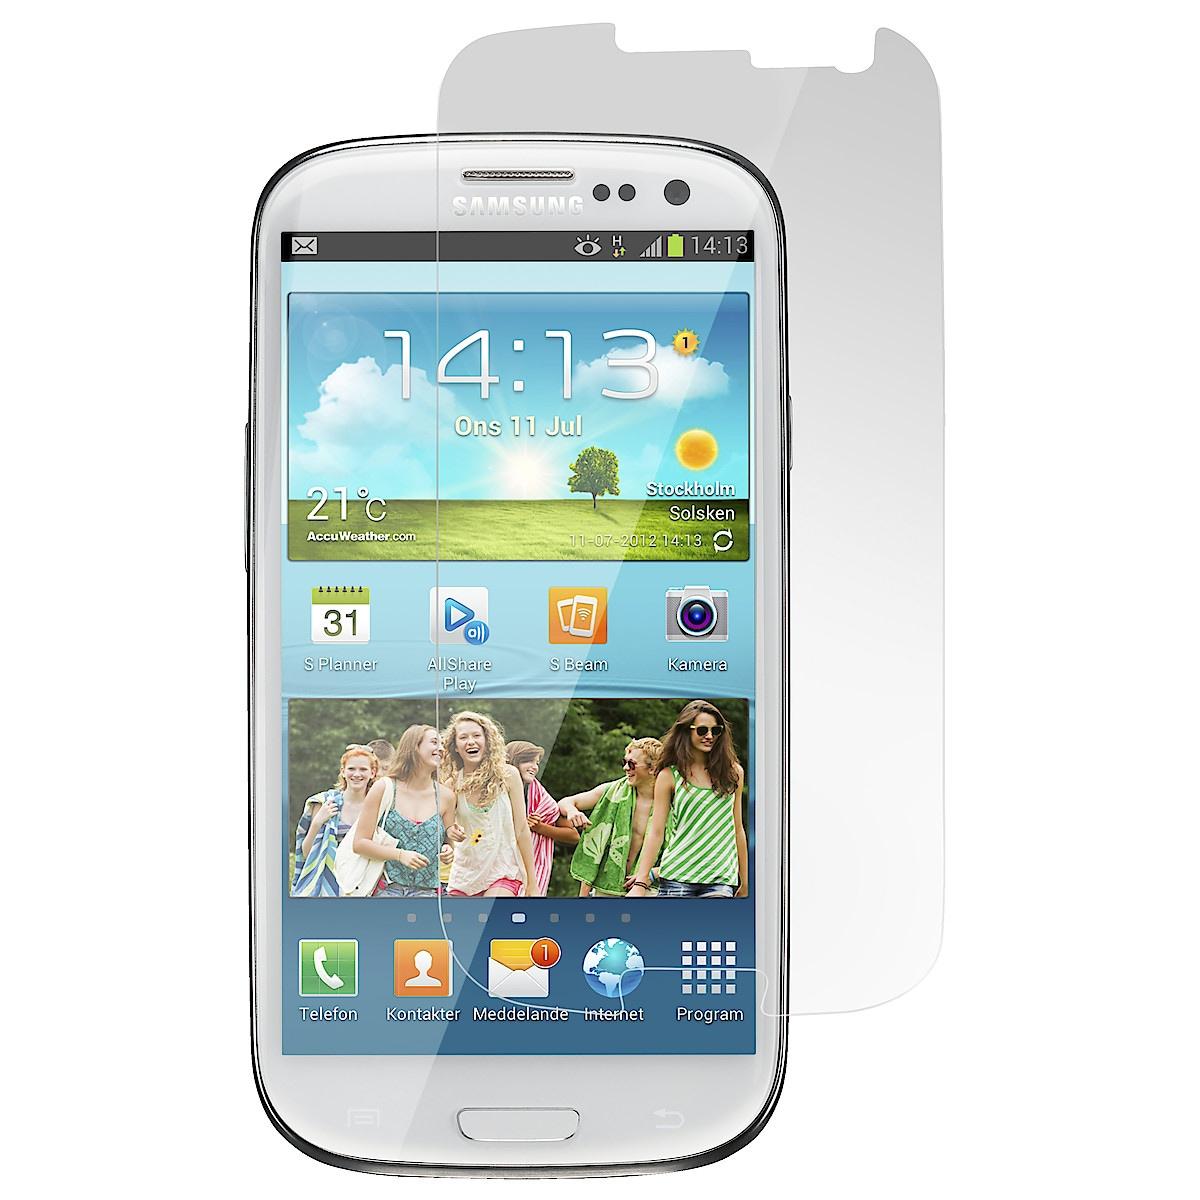 Startsett for Samsung Galaxy S III Xqisit